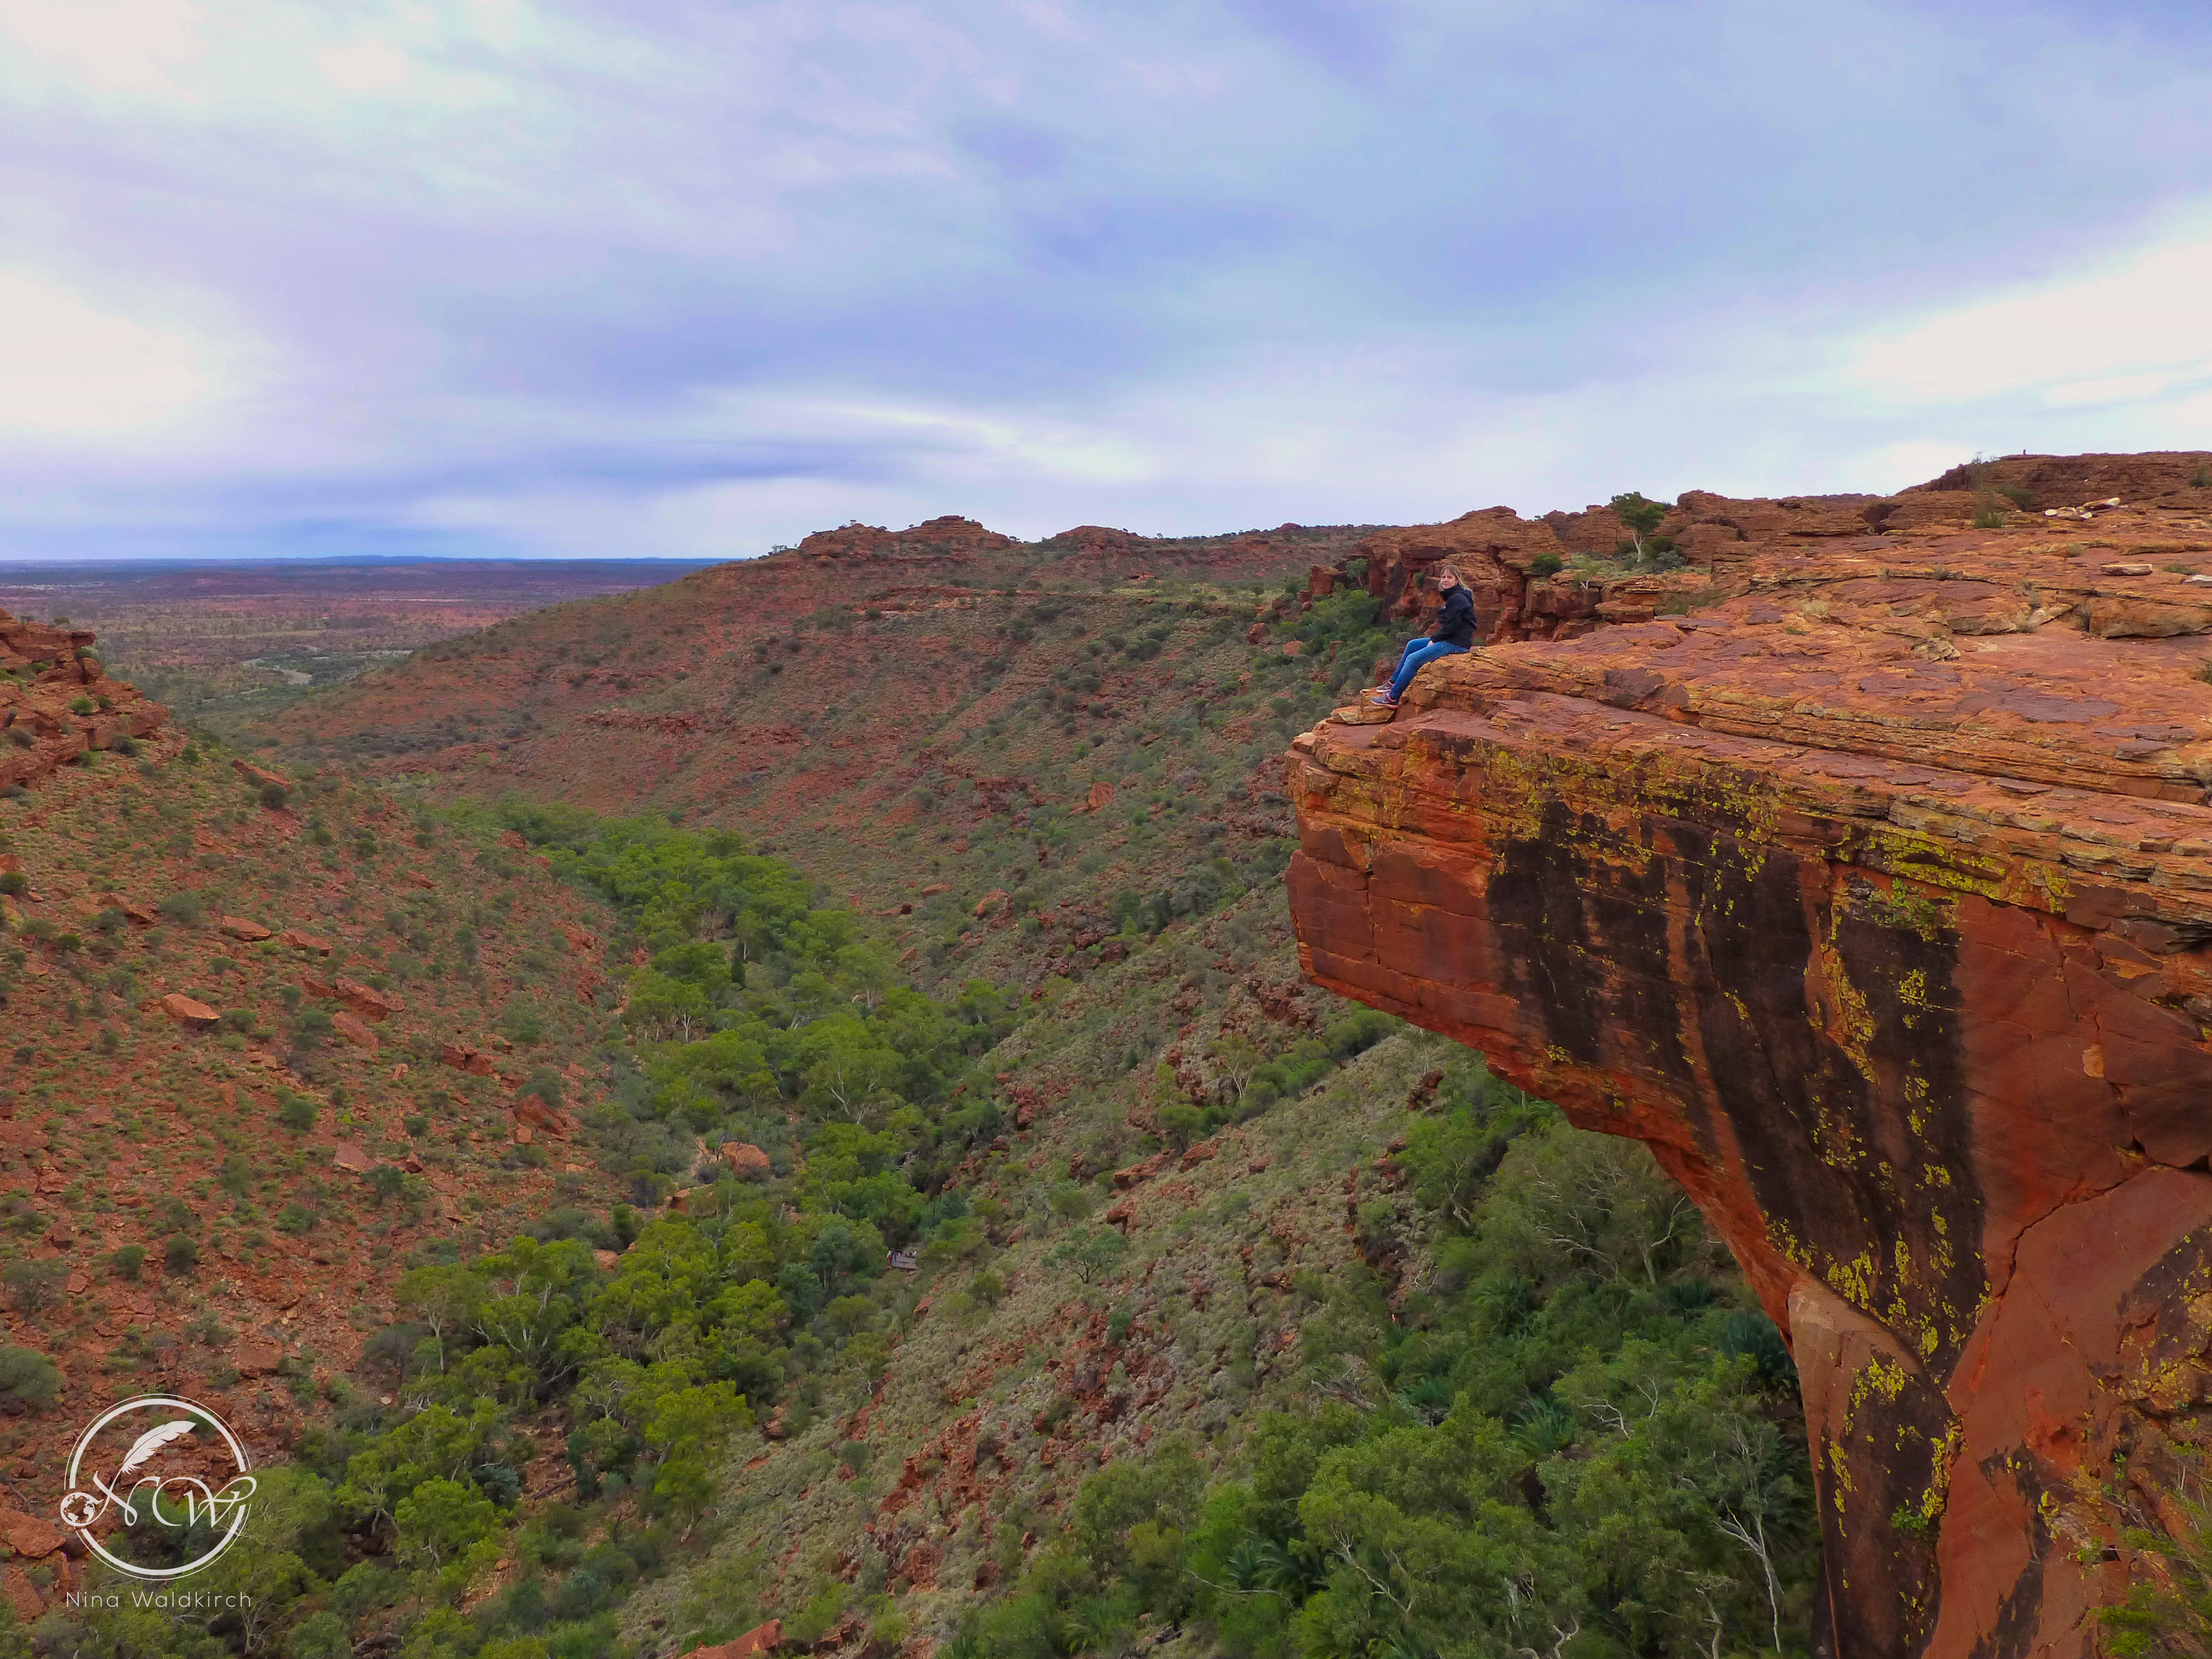 Ruhestörung im australischen Kings Canyon | story.one